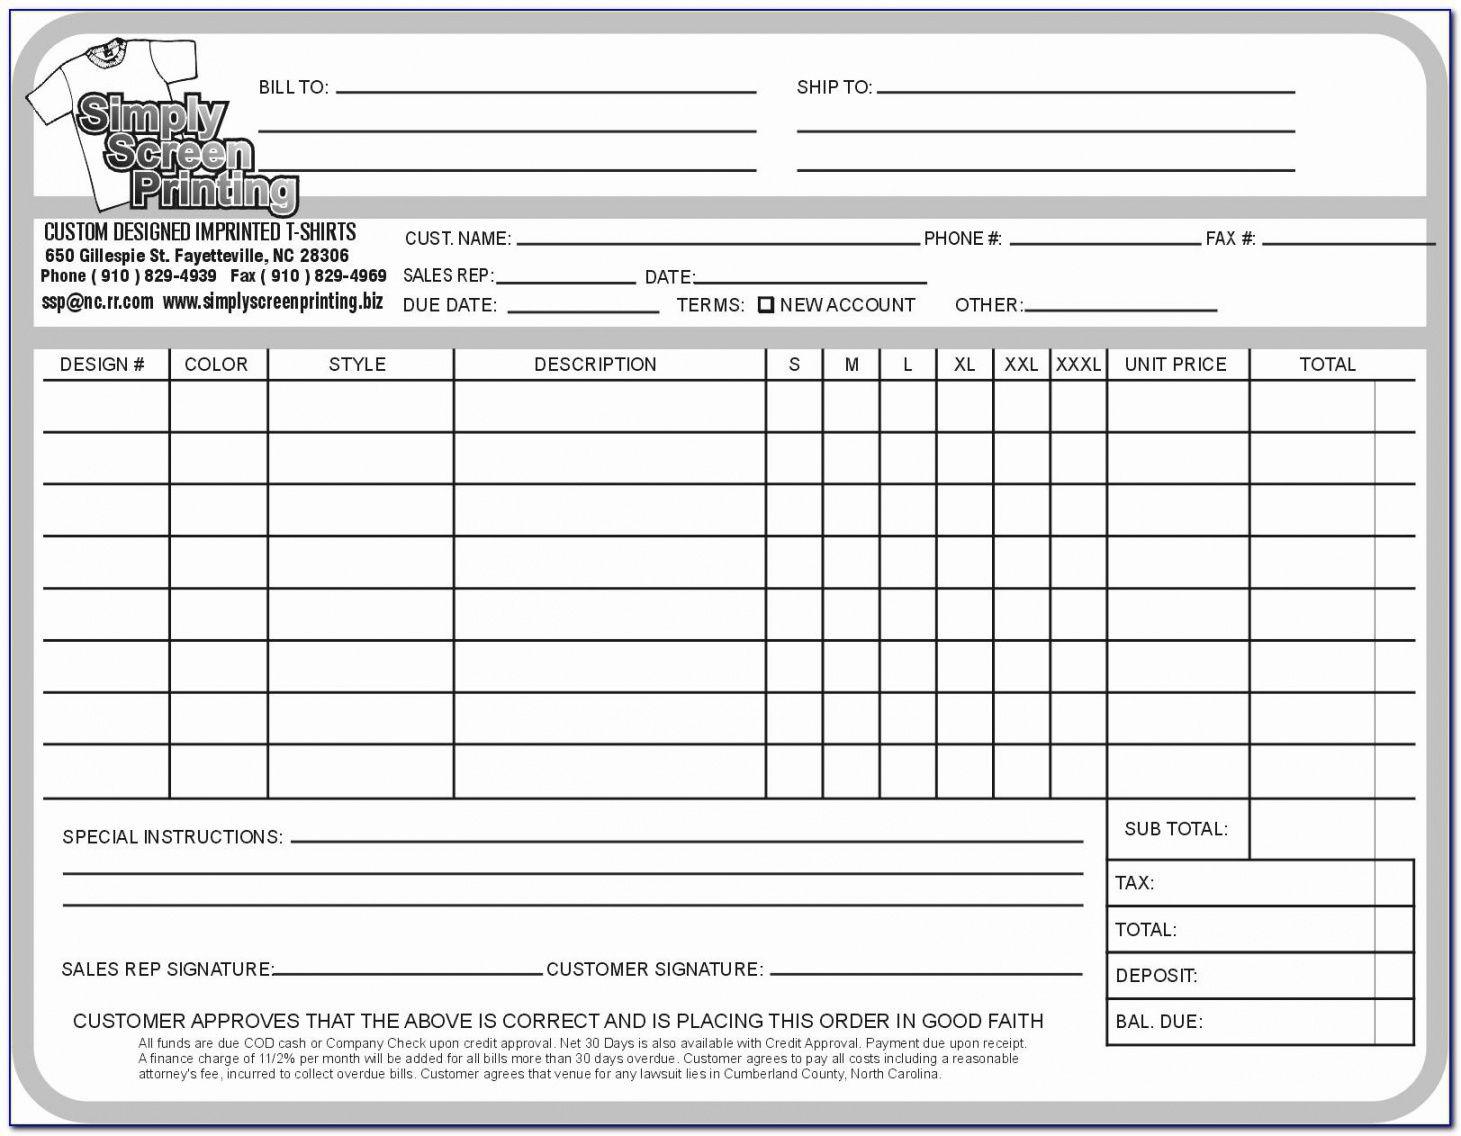 free sponsorship proposal template word doc auto racing sponsorship proposal template